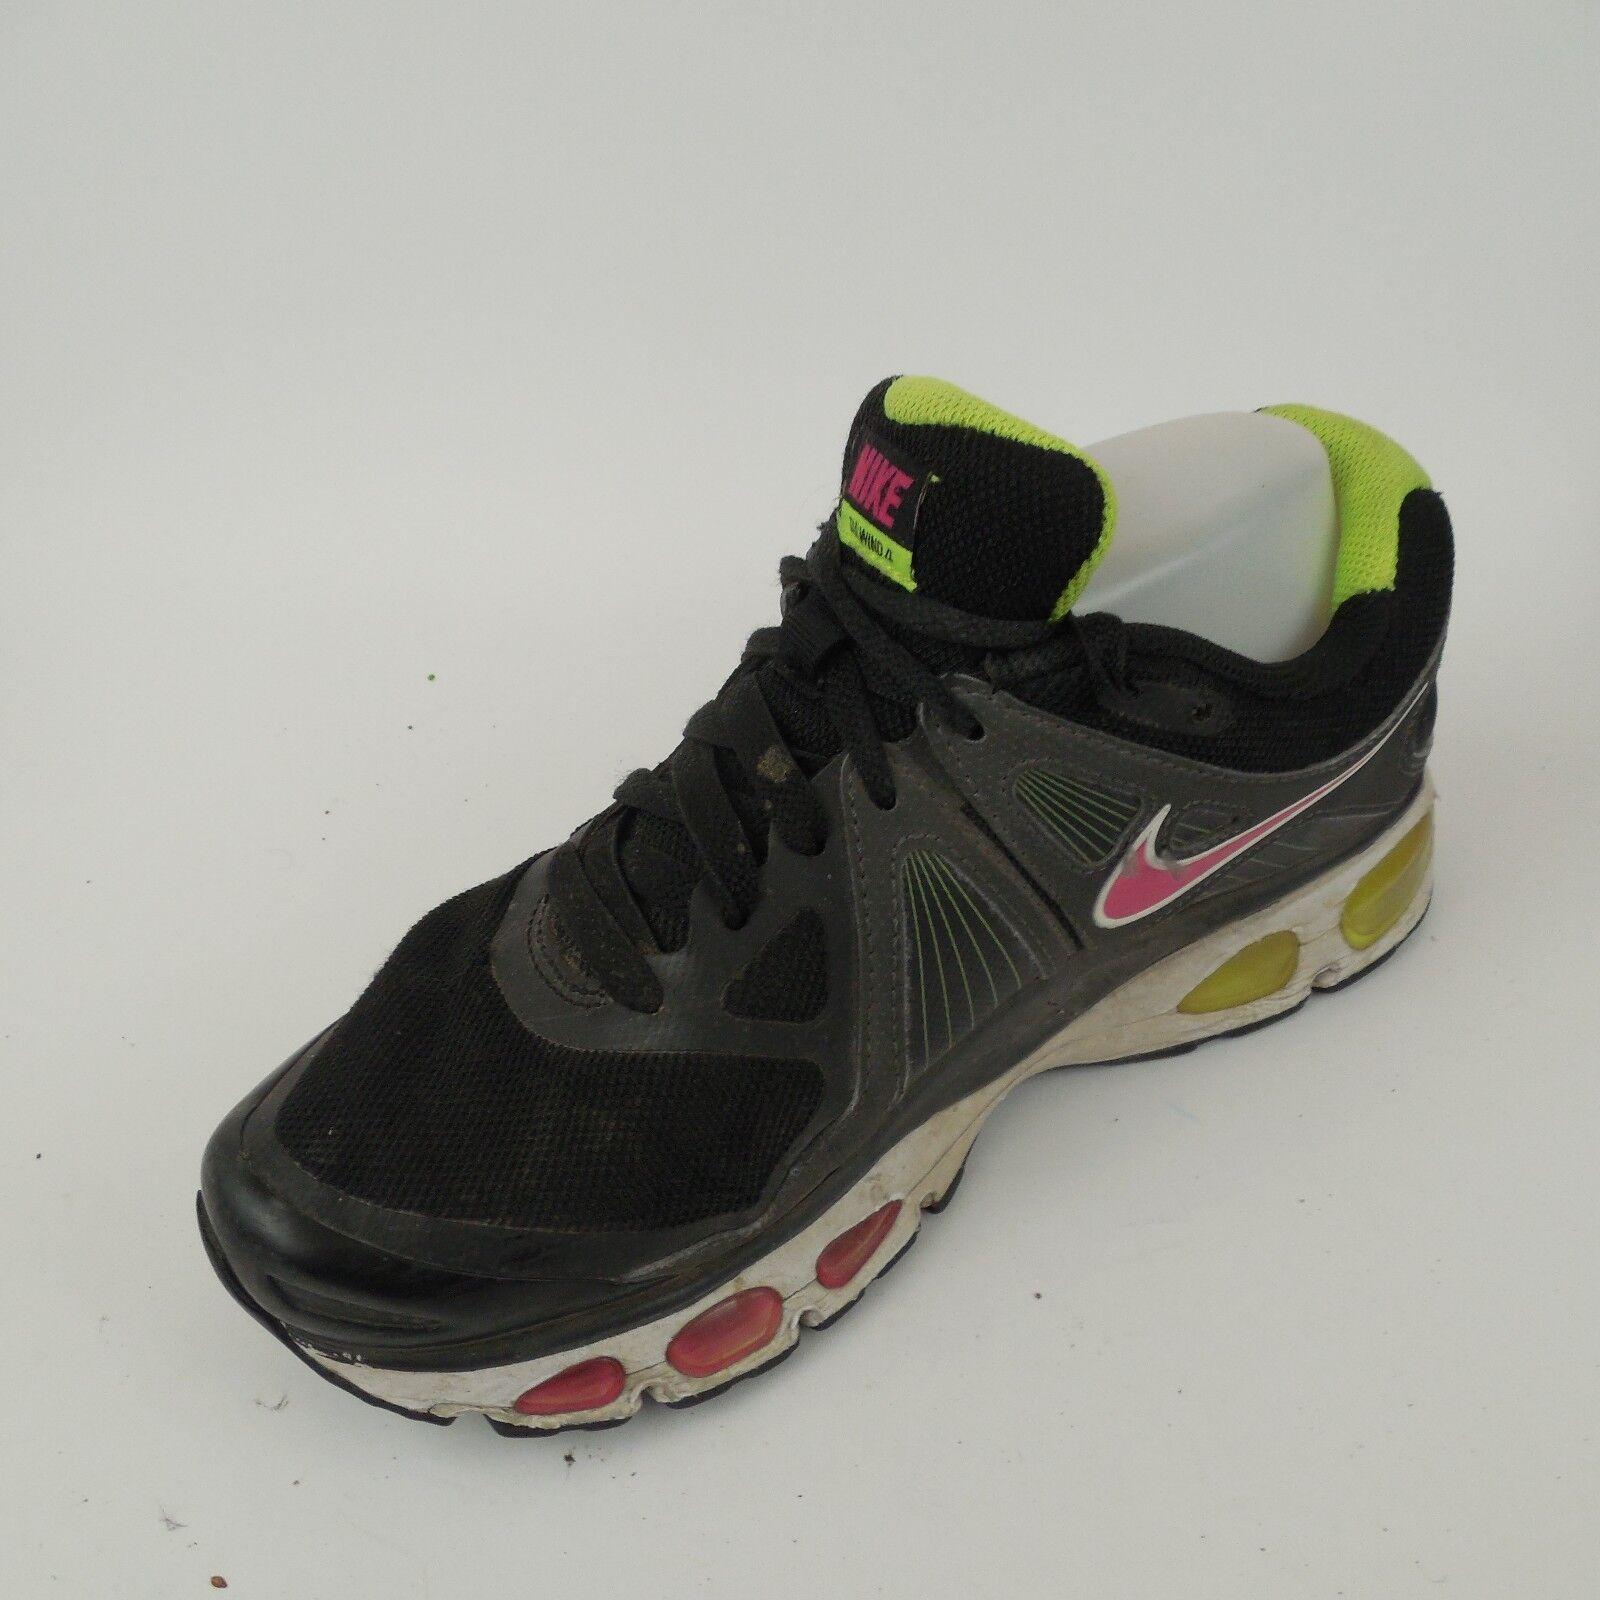 4 Max Noire Chaussures Fireberry Tailwind Femmes Air Nike qPx4nA